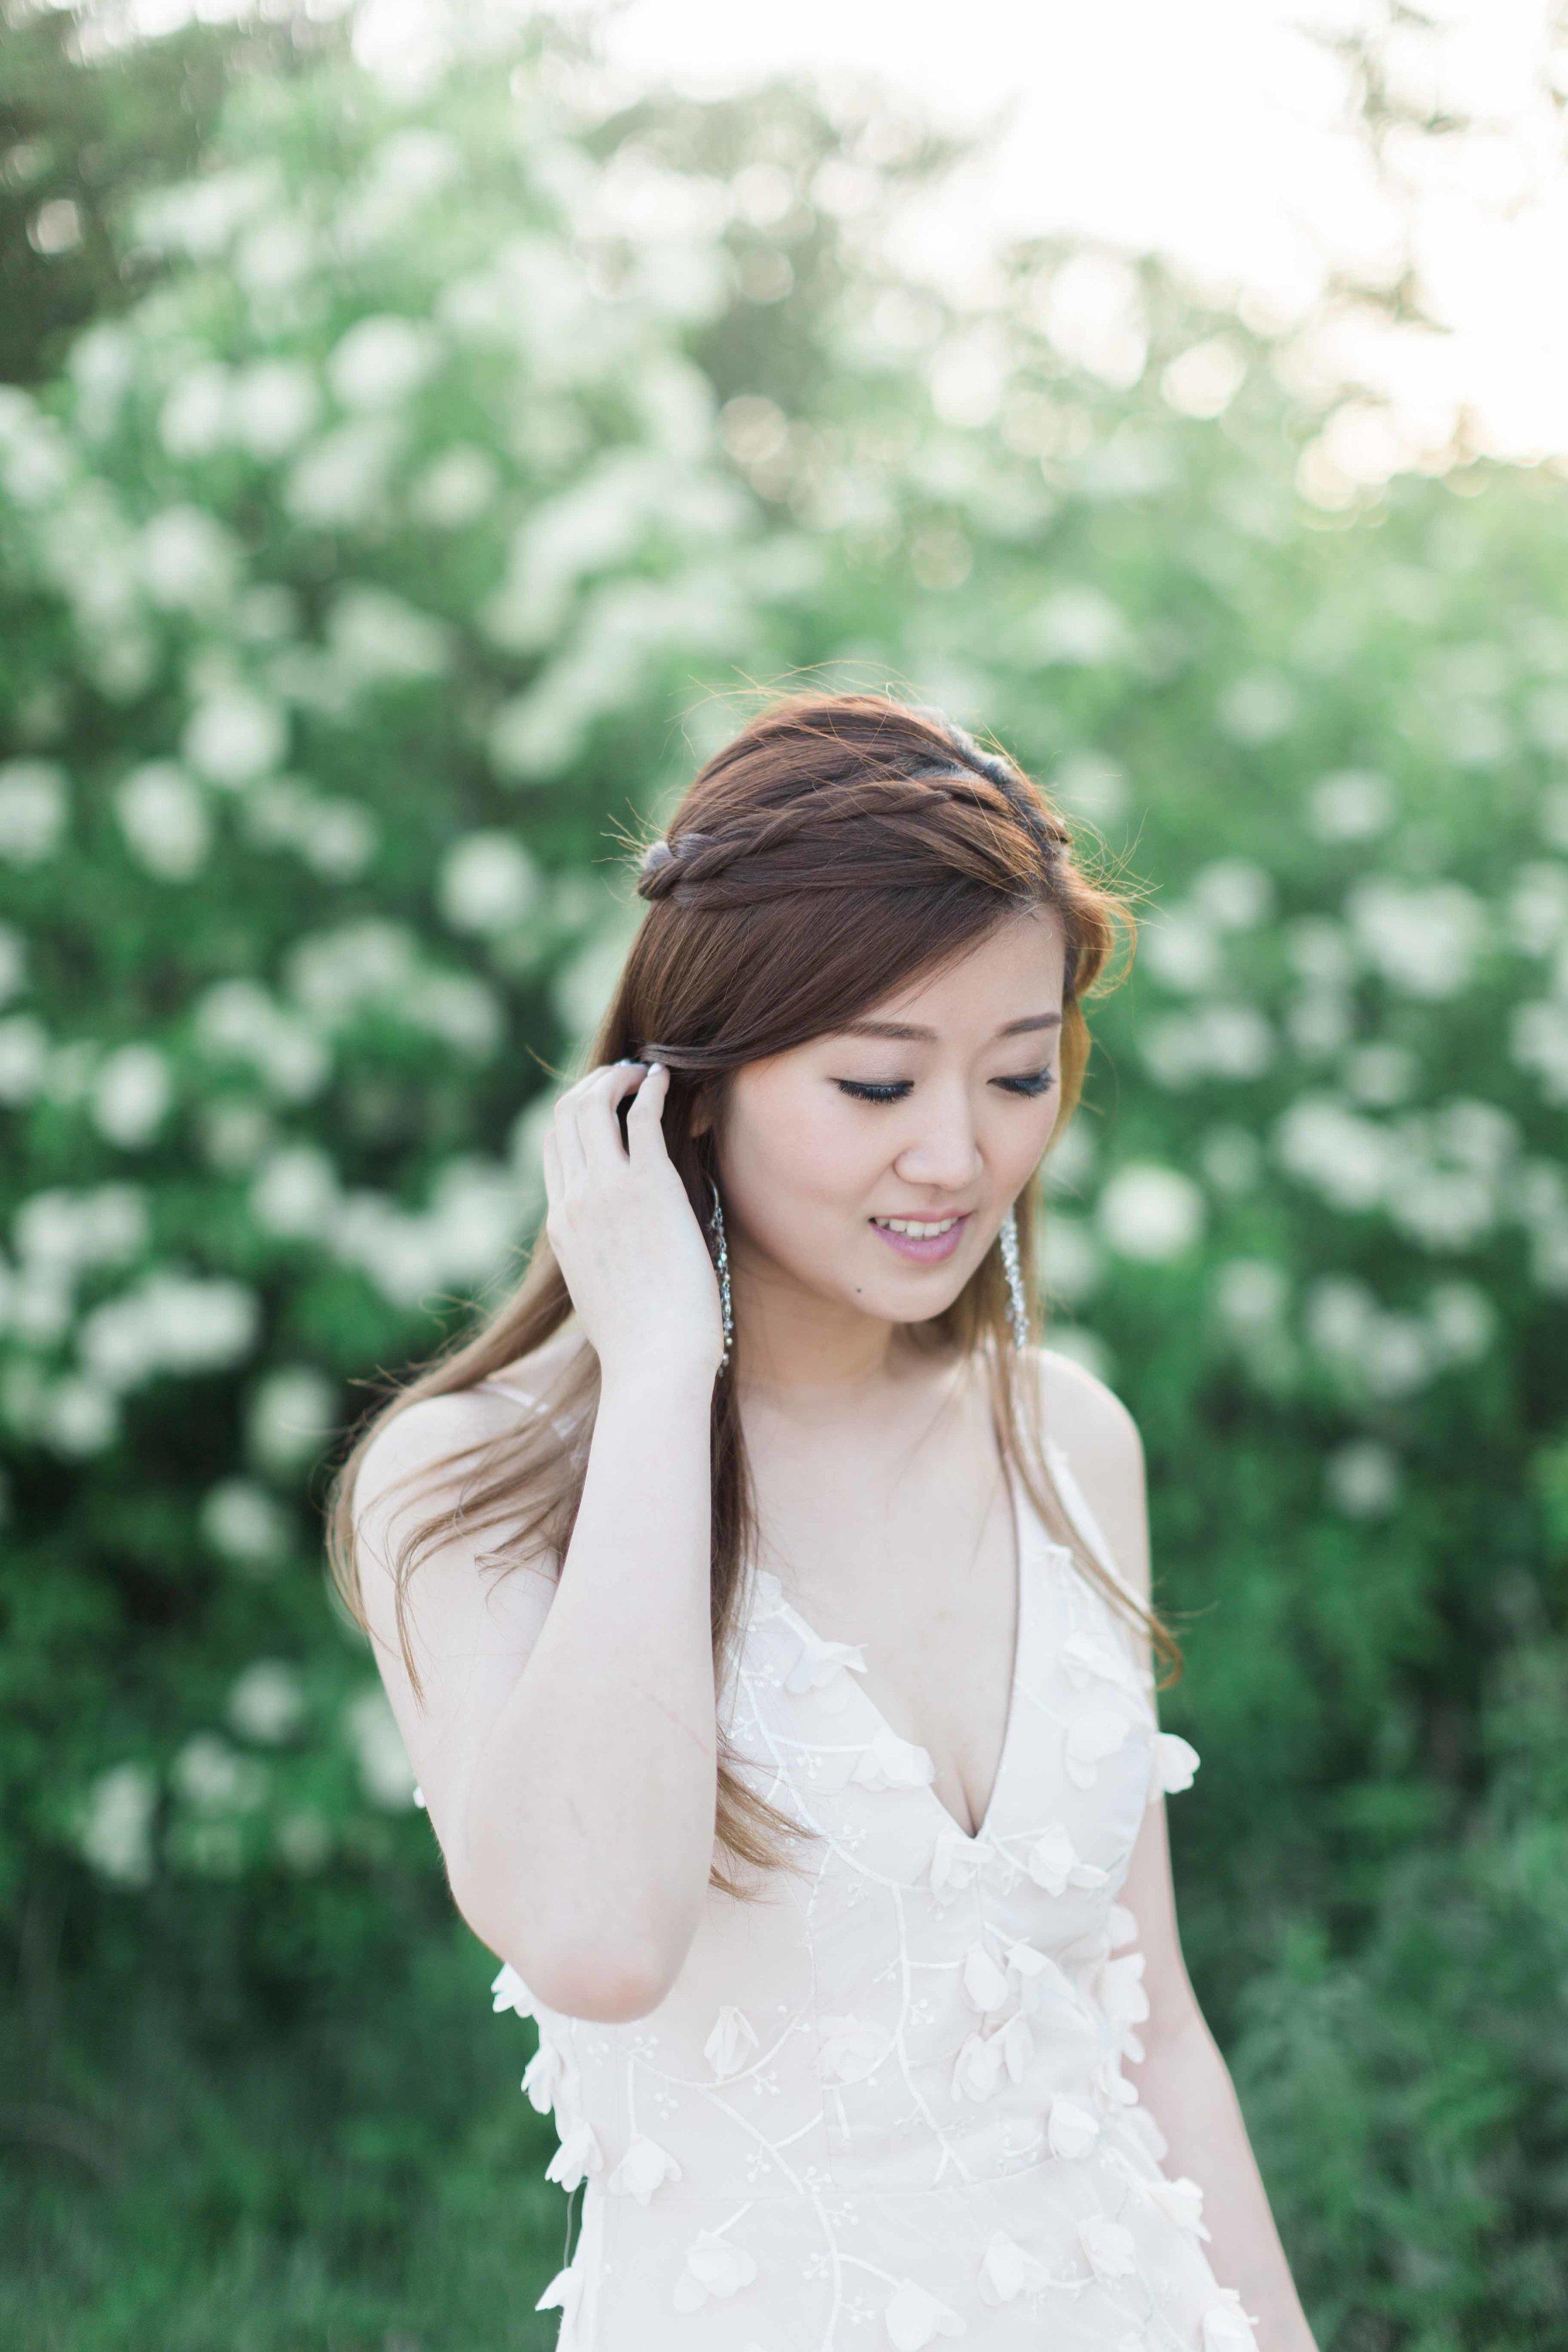 Cari Zhu Fine Art Photographer - Scarborough Bluffs Engagement Session-25.jpg